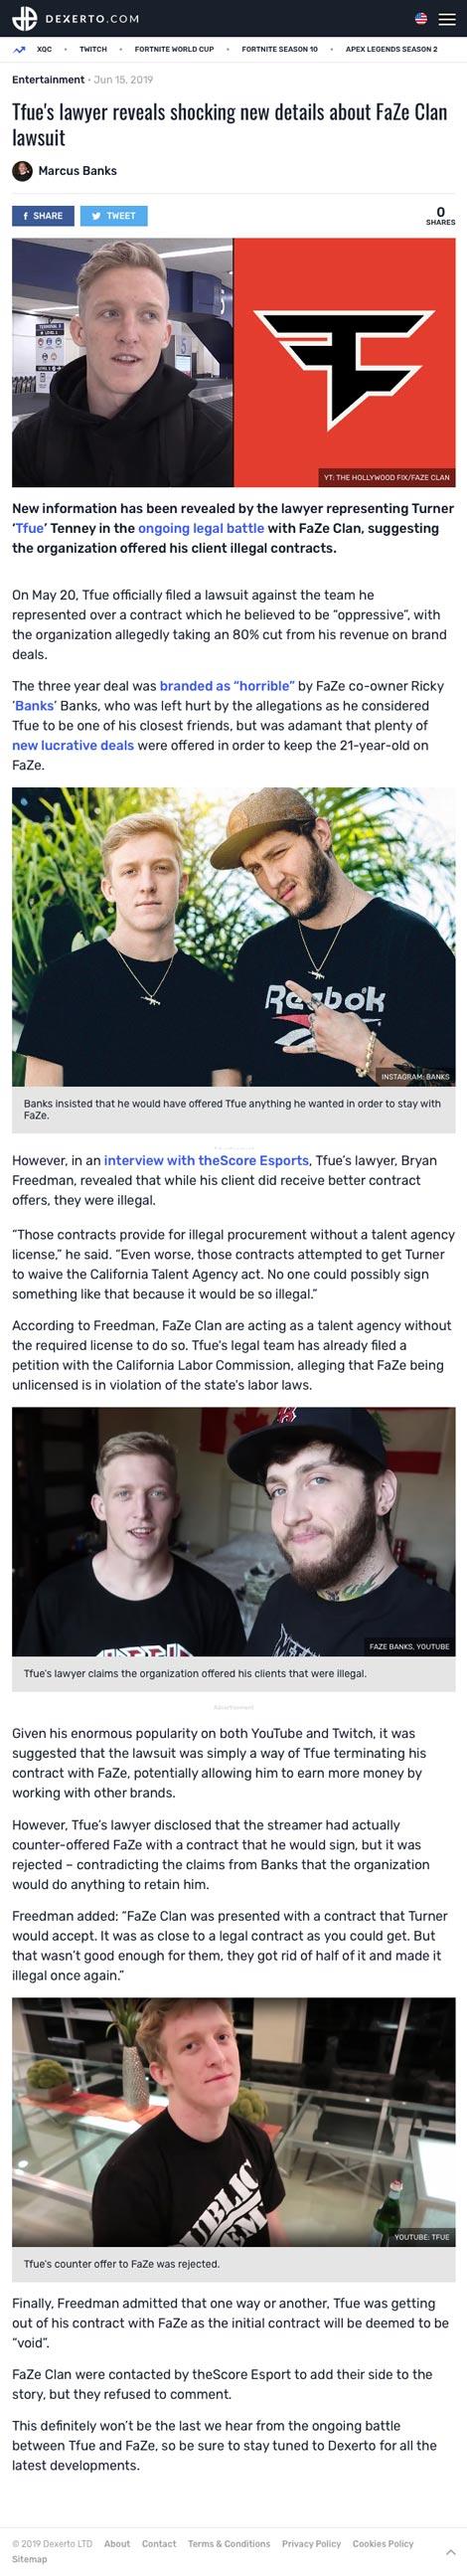 Tfue's lawyer reveals shocking new details about FaZe Clan lawsuit - article by Dexerto.com